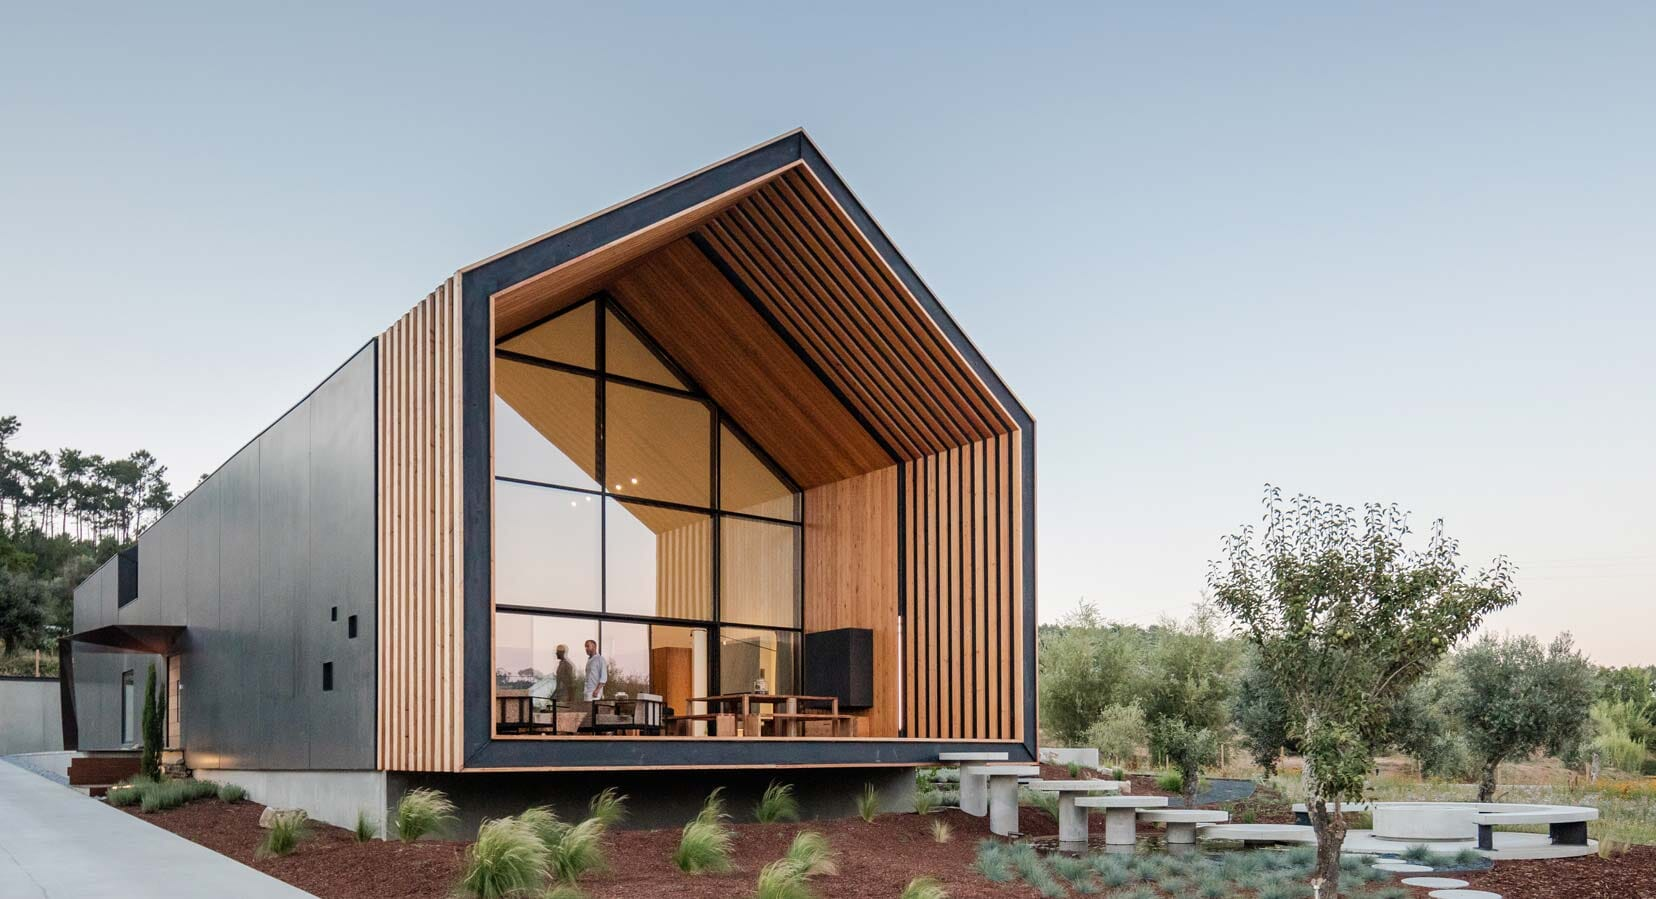 Filipe Saraiva Arquitectos Designs Pentagonal House-Shaped Residence In Rural Portgual